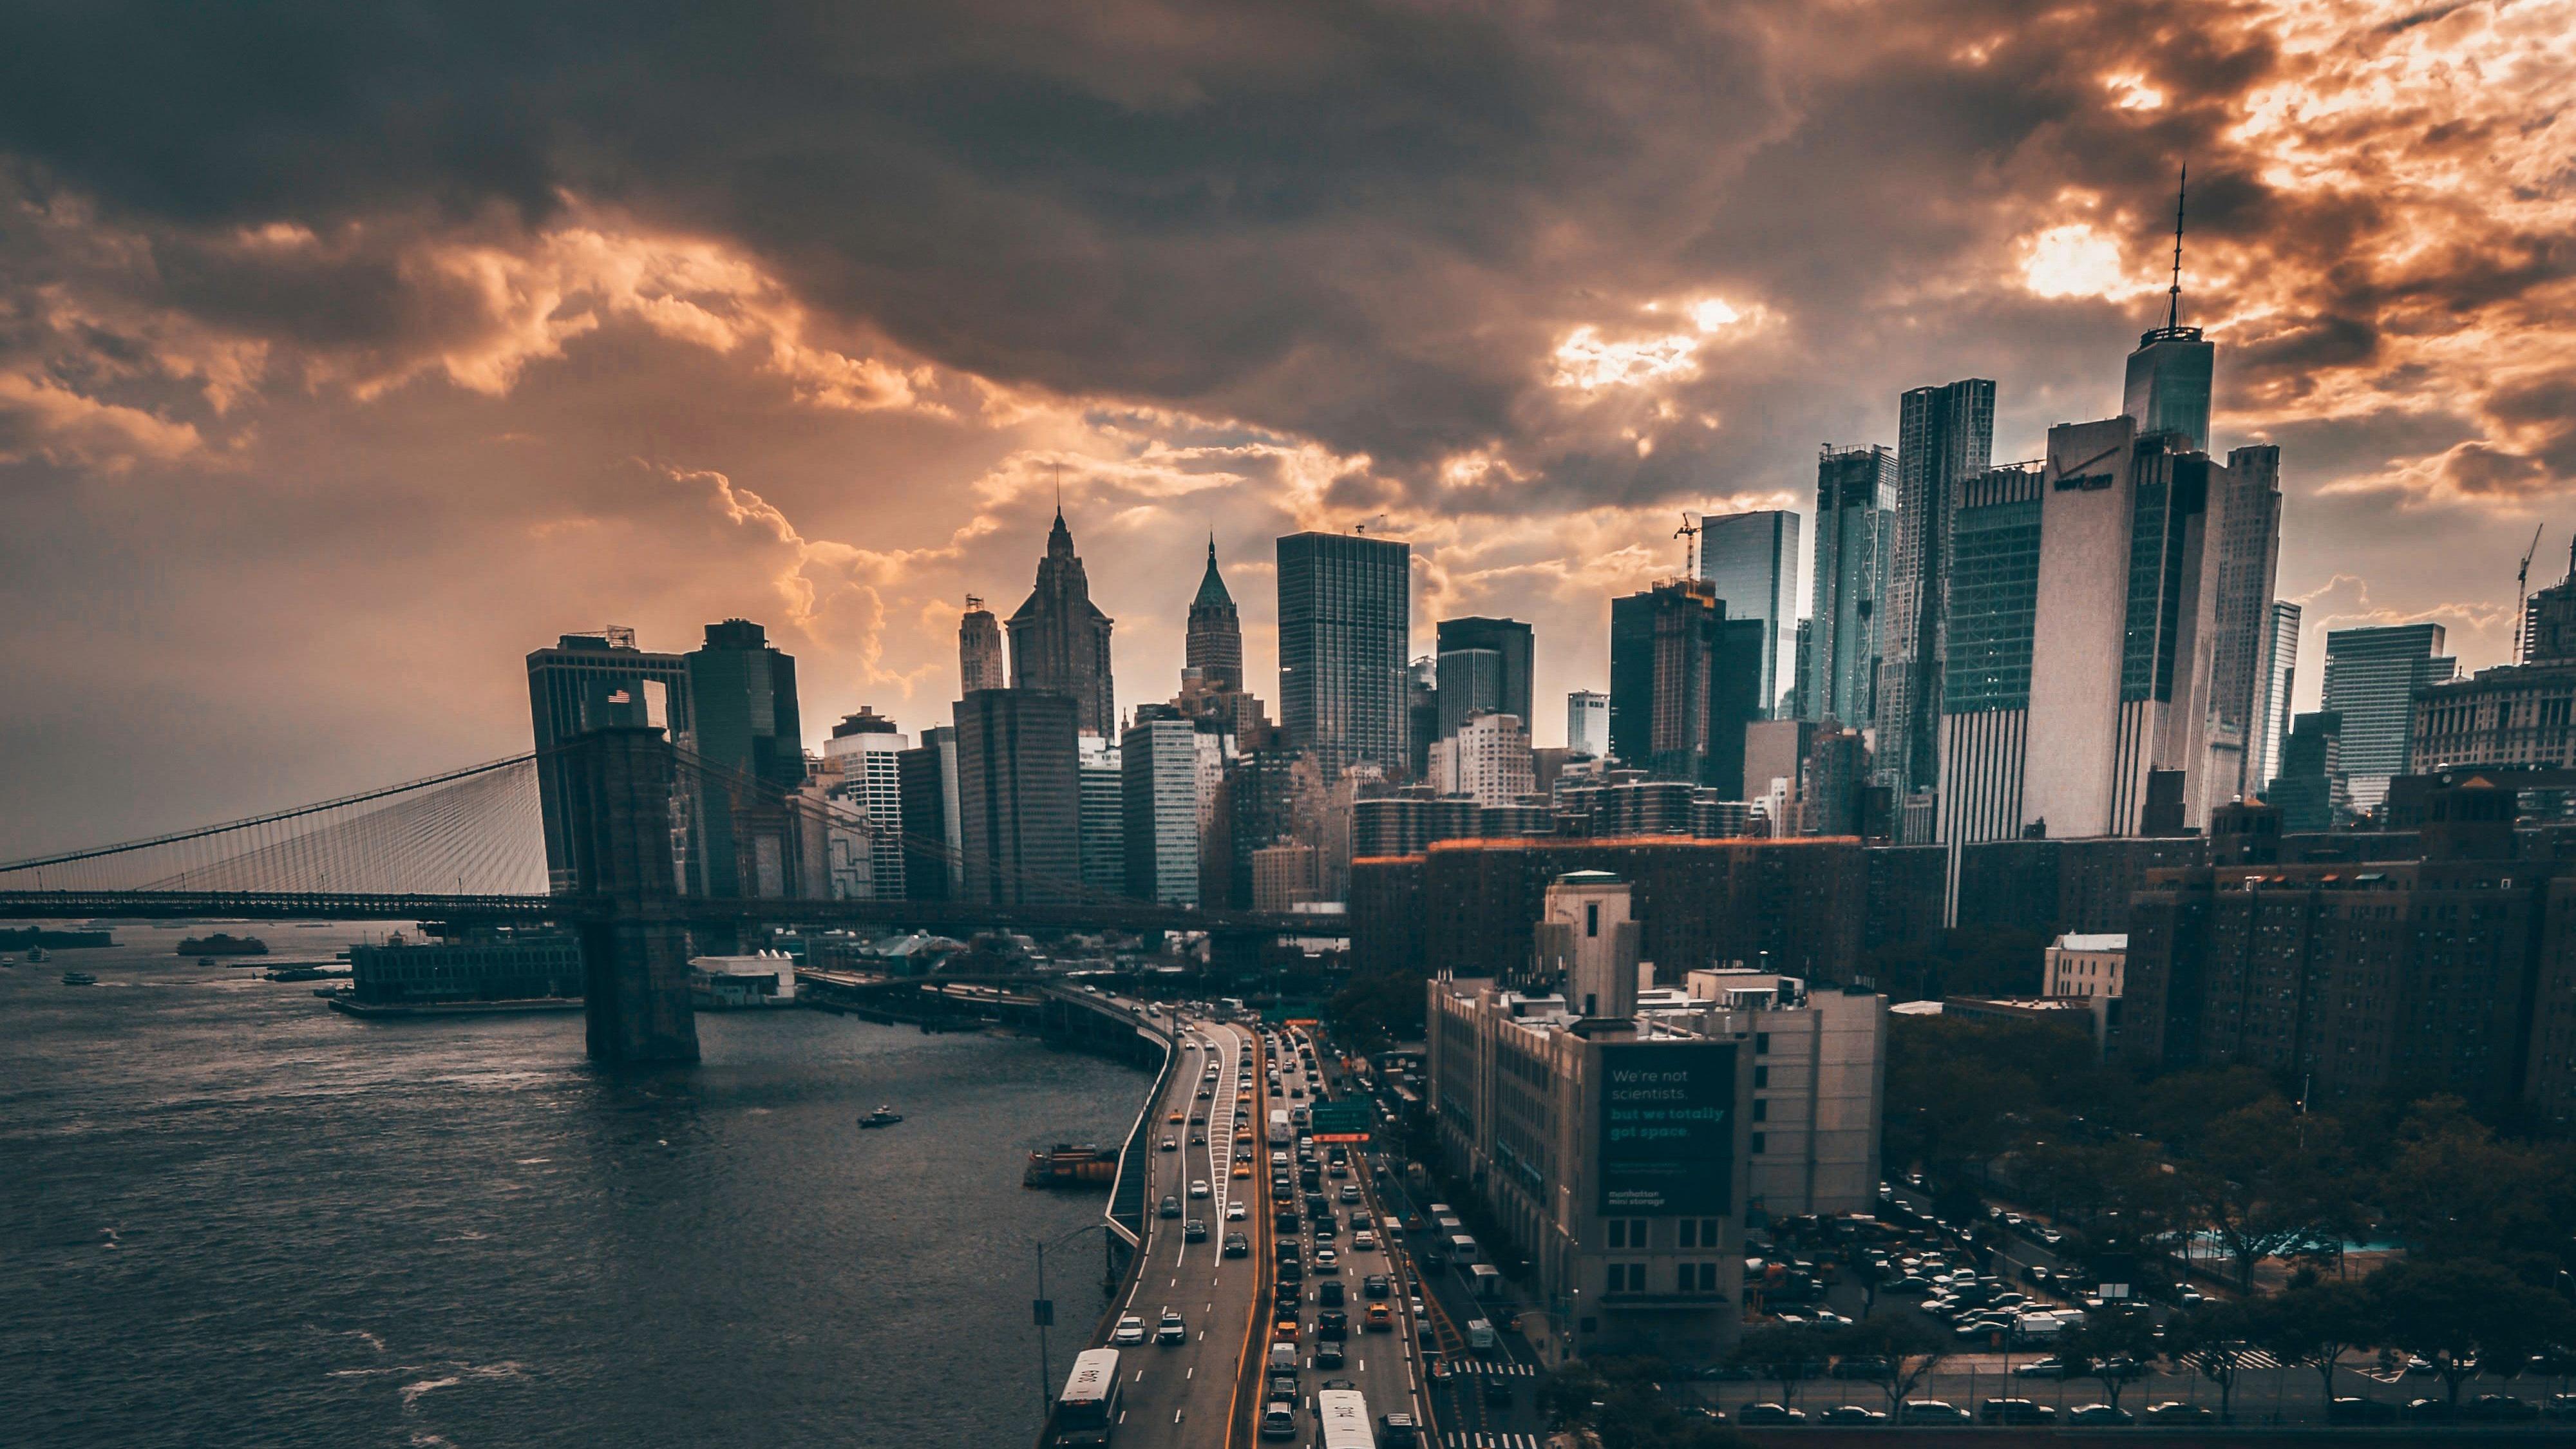 Manhattan New York City 4k, HD World, 4k Wallpapers